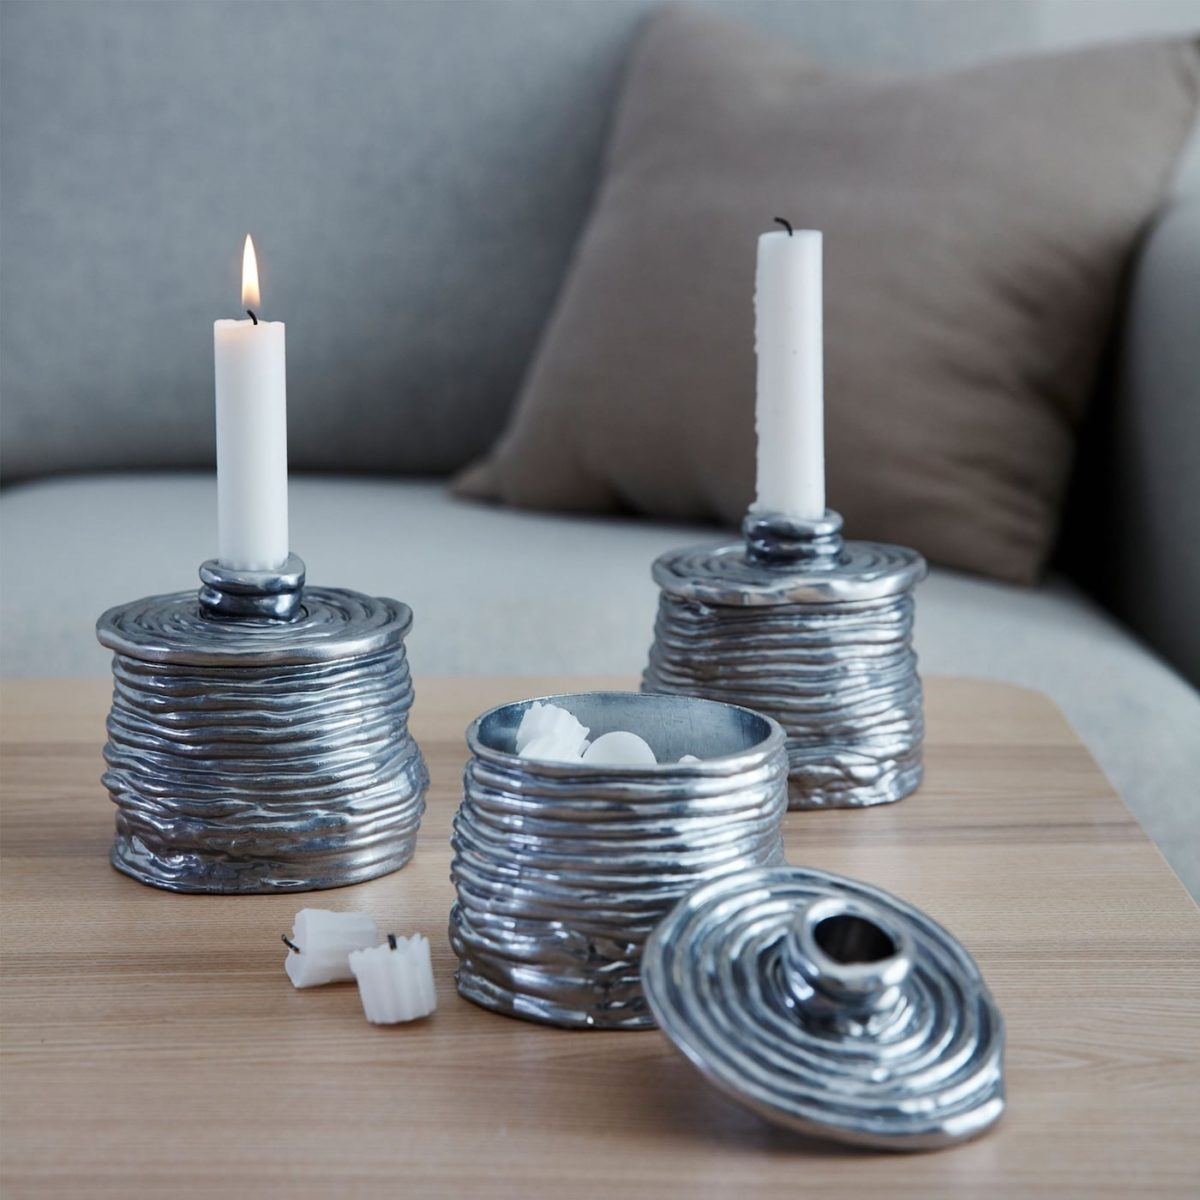 collezione-ikea-varmer-candeliere